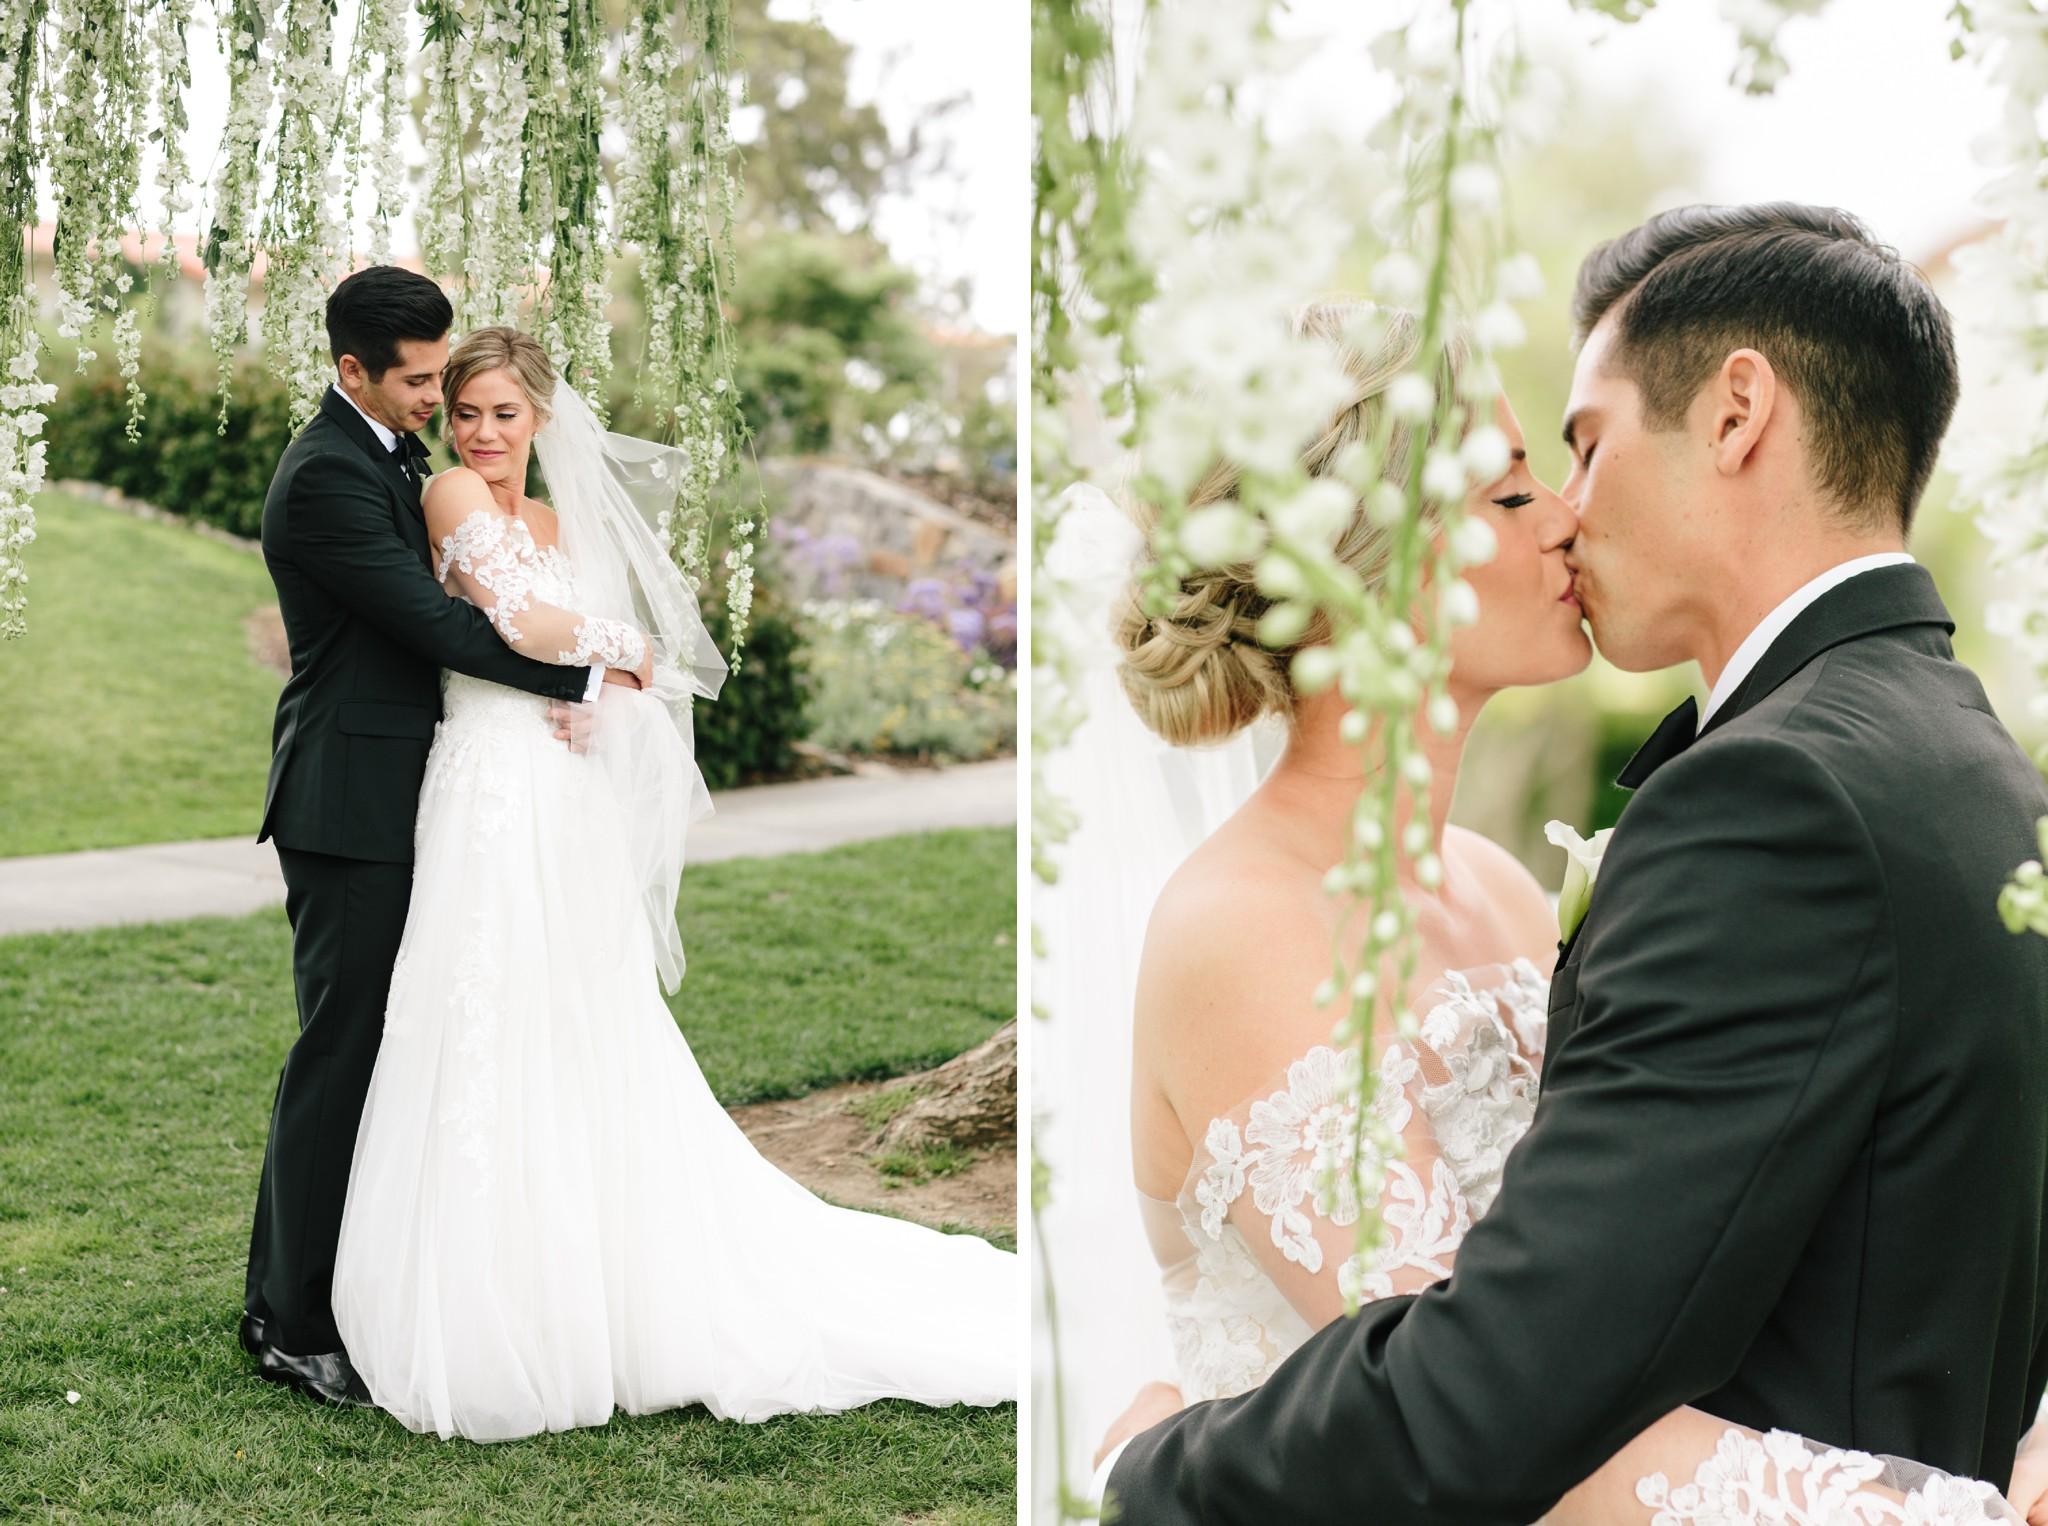 THEDELAURAS_THE_INN_AT_RANCHO_SANTA_FE_WEDDING_CEREMONY FLOWERS_BLOG002.jpg